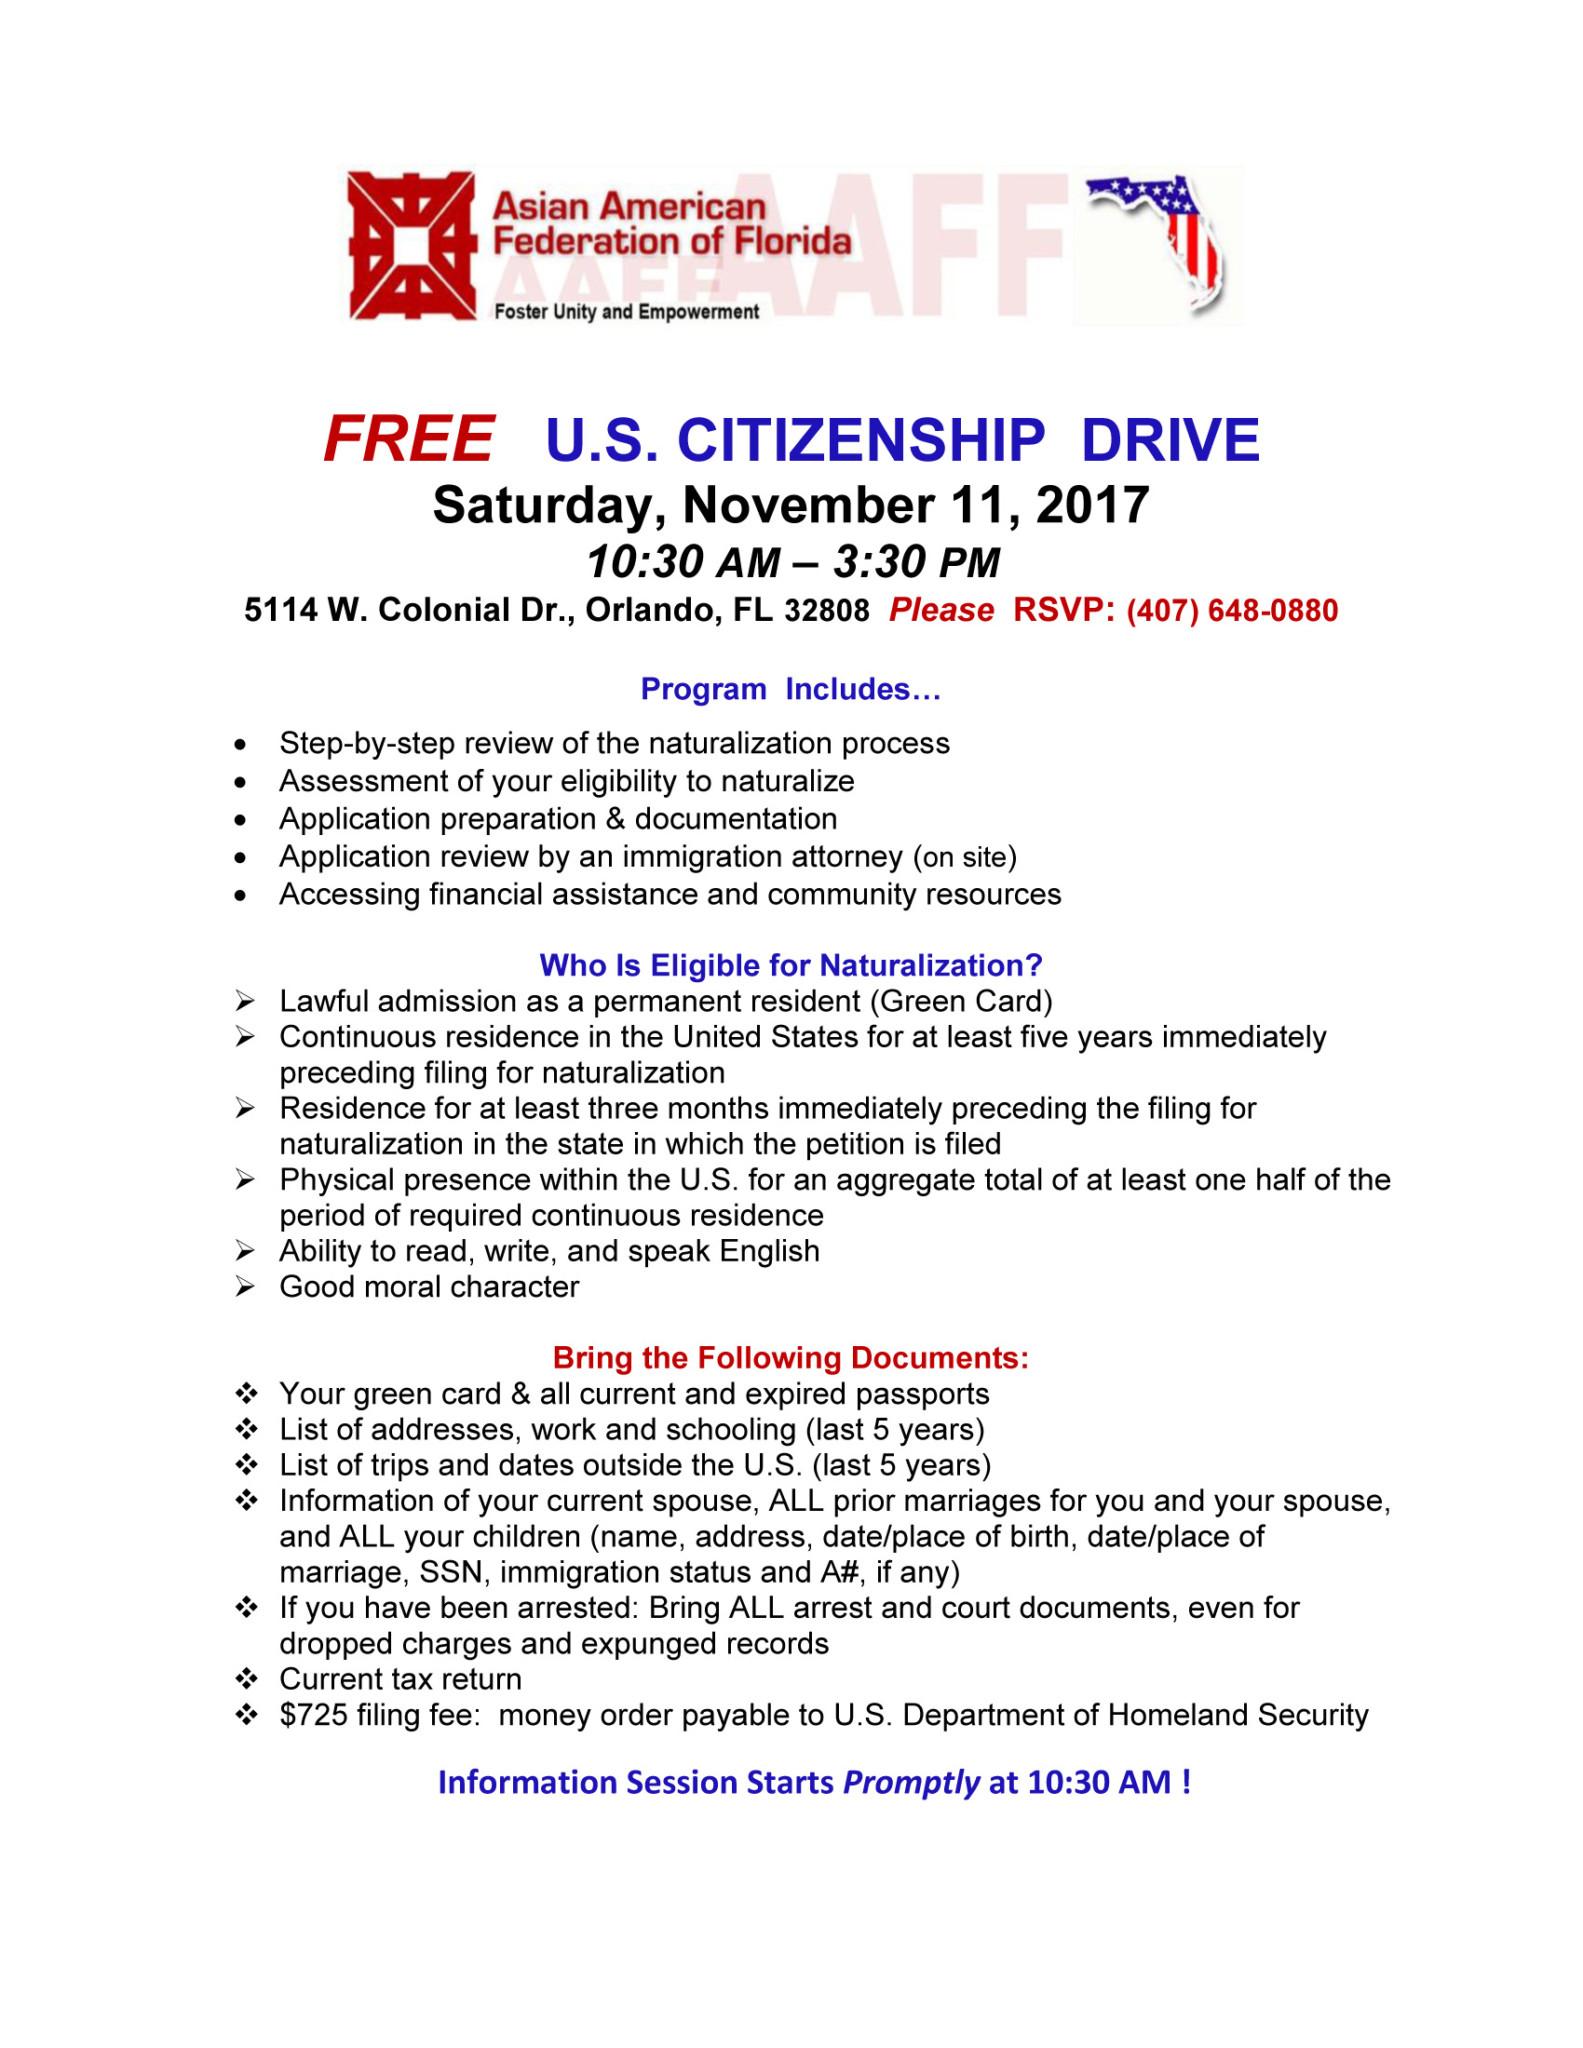 U.S. CITIZENSHIP DRIVE